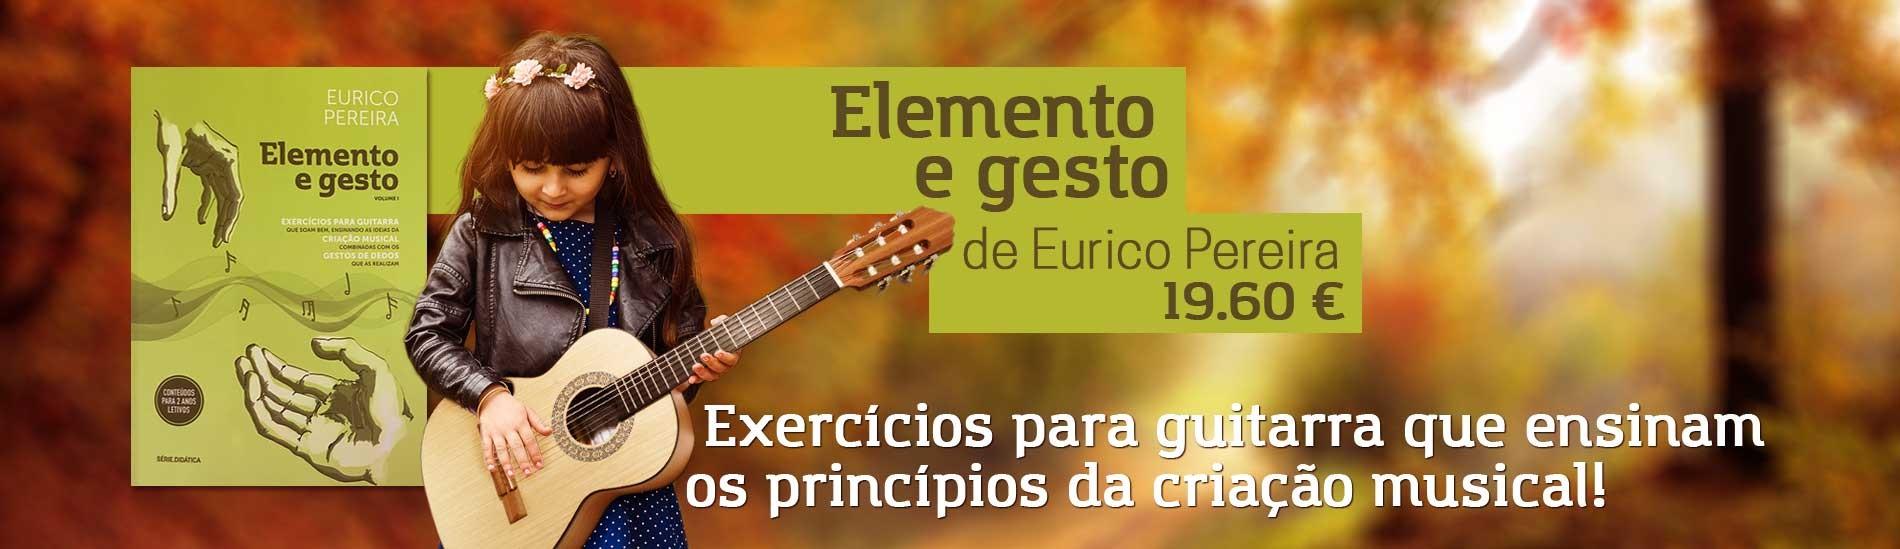 Livro Elemento e Gesto Vol 1 de Eurico Pereira